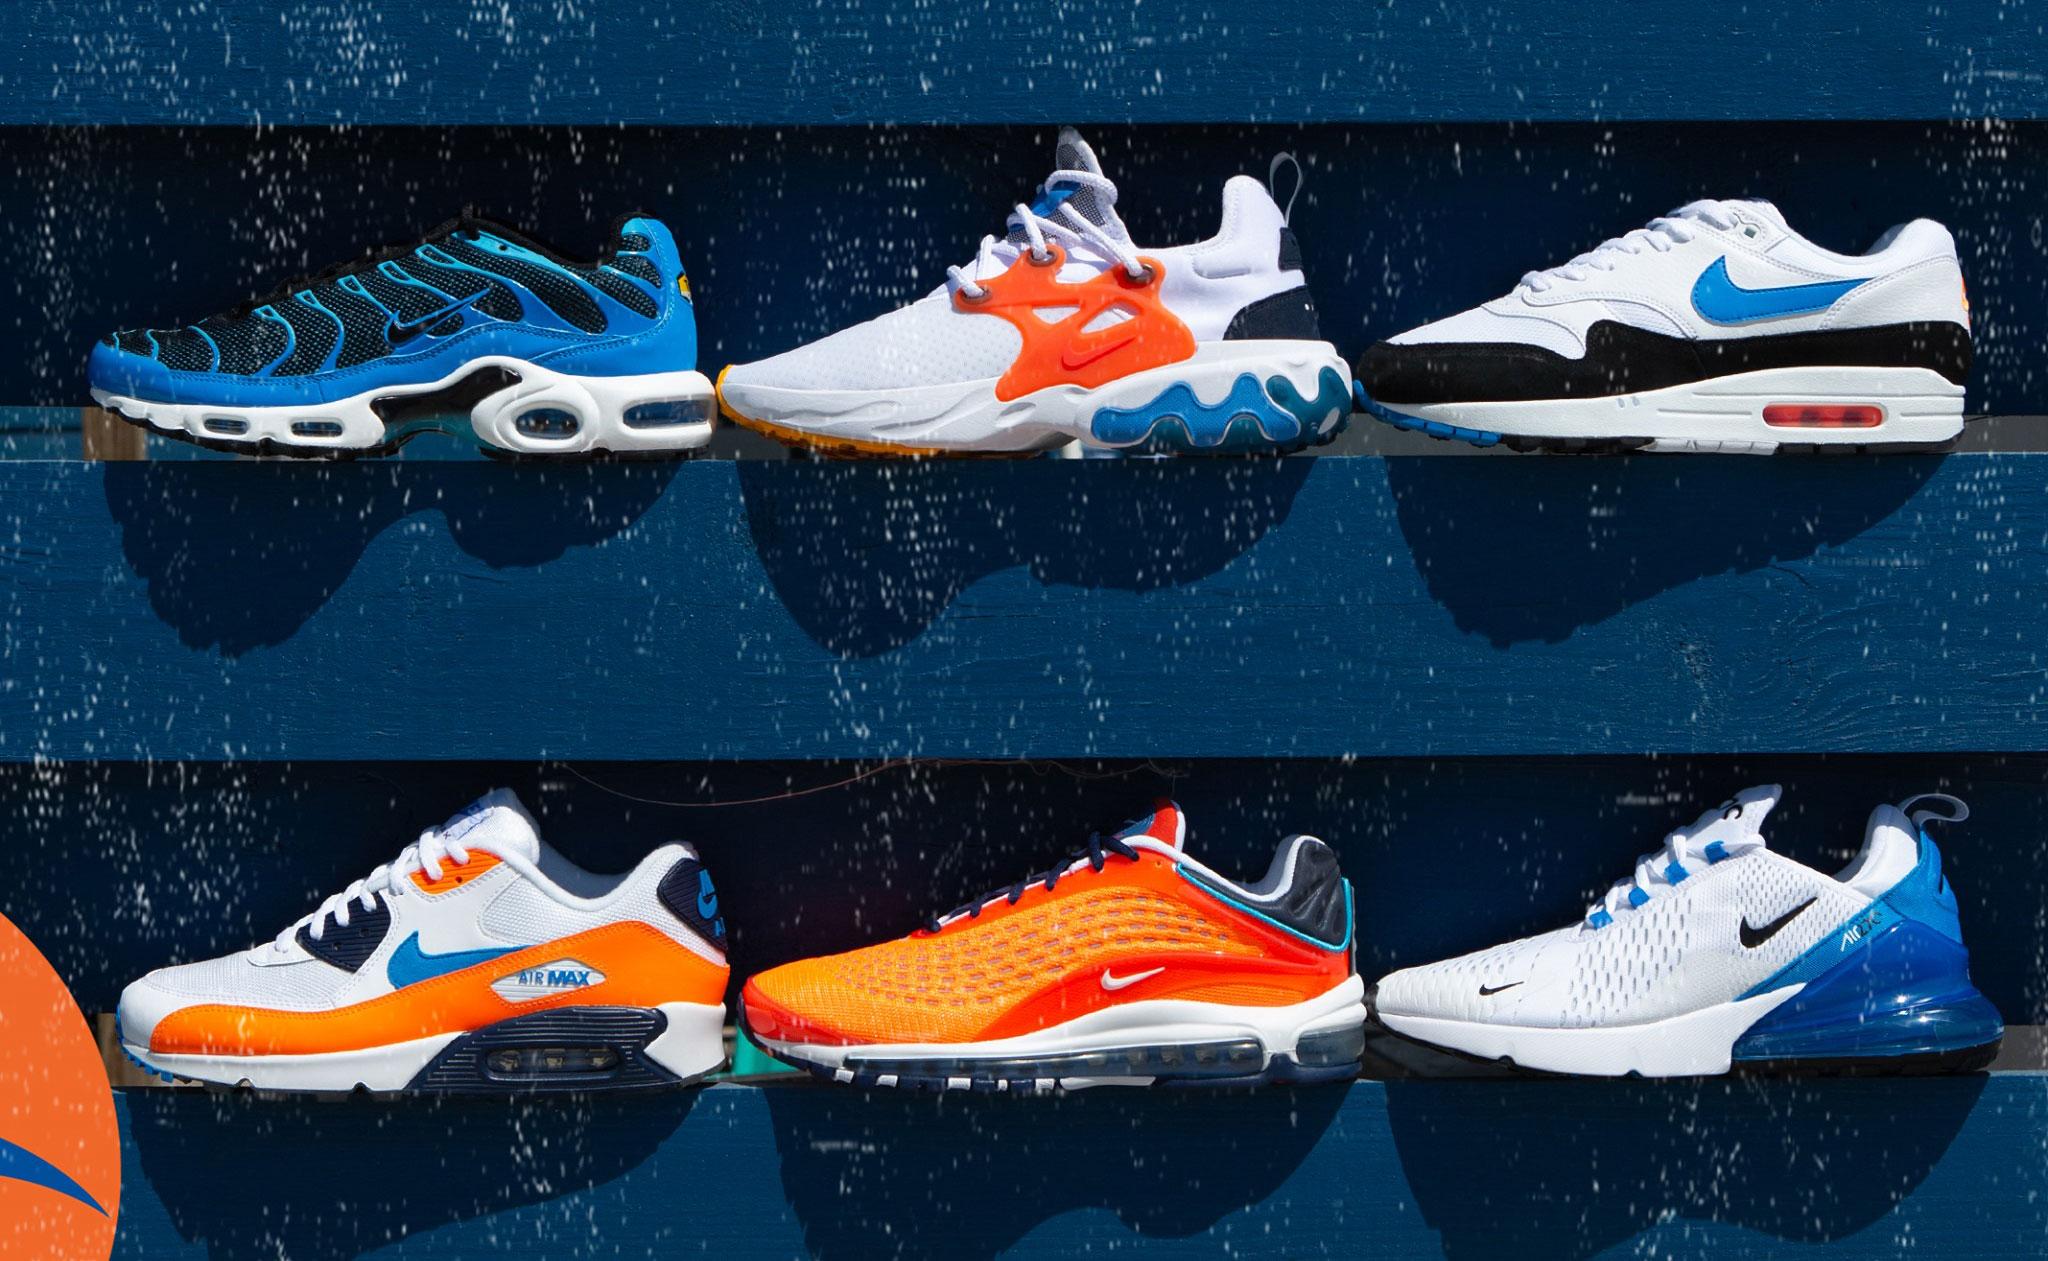 nike-air-max-endless-summer-sneakers